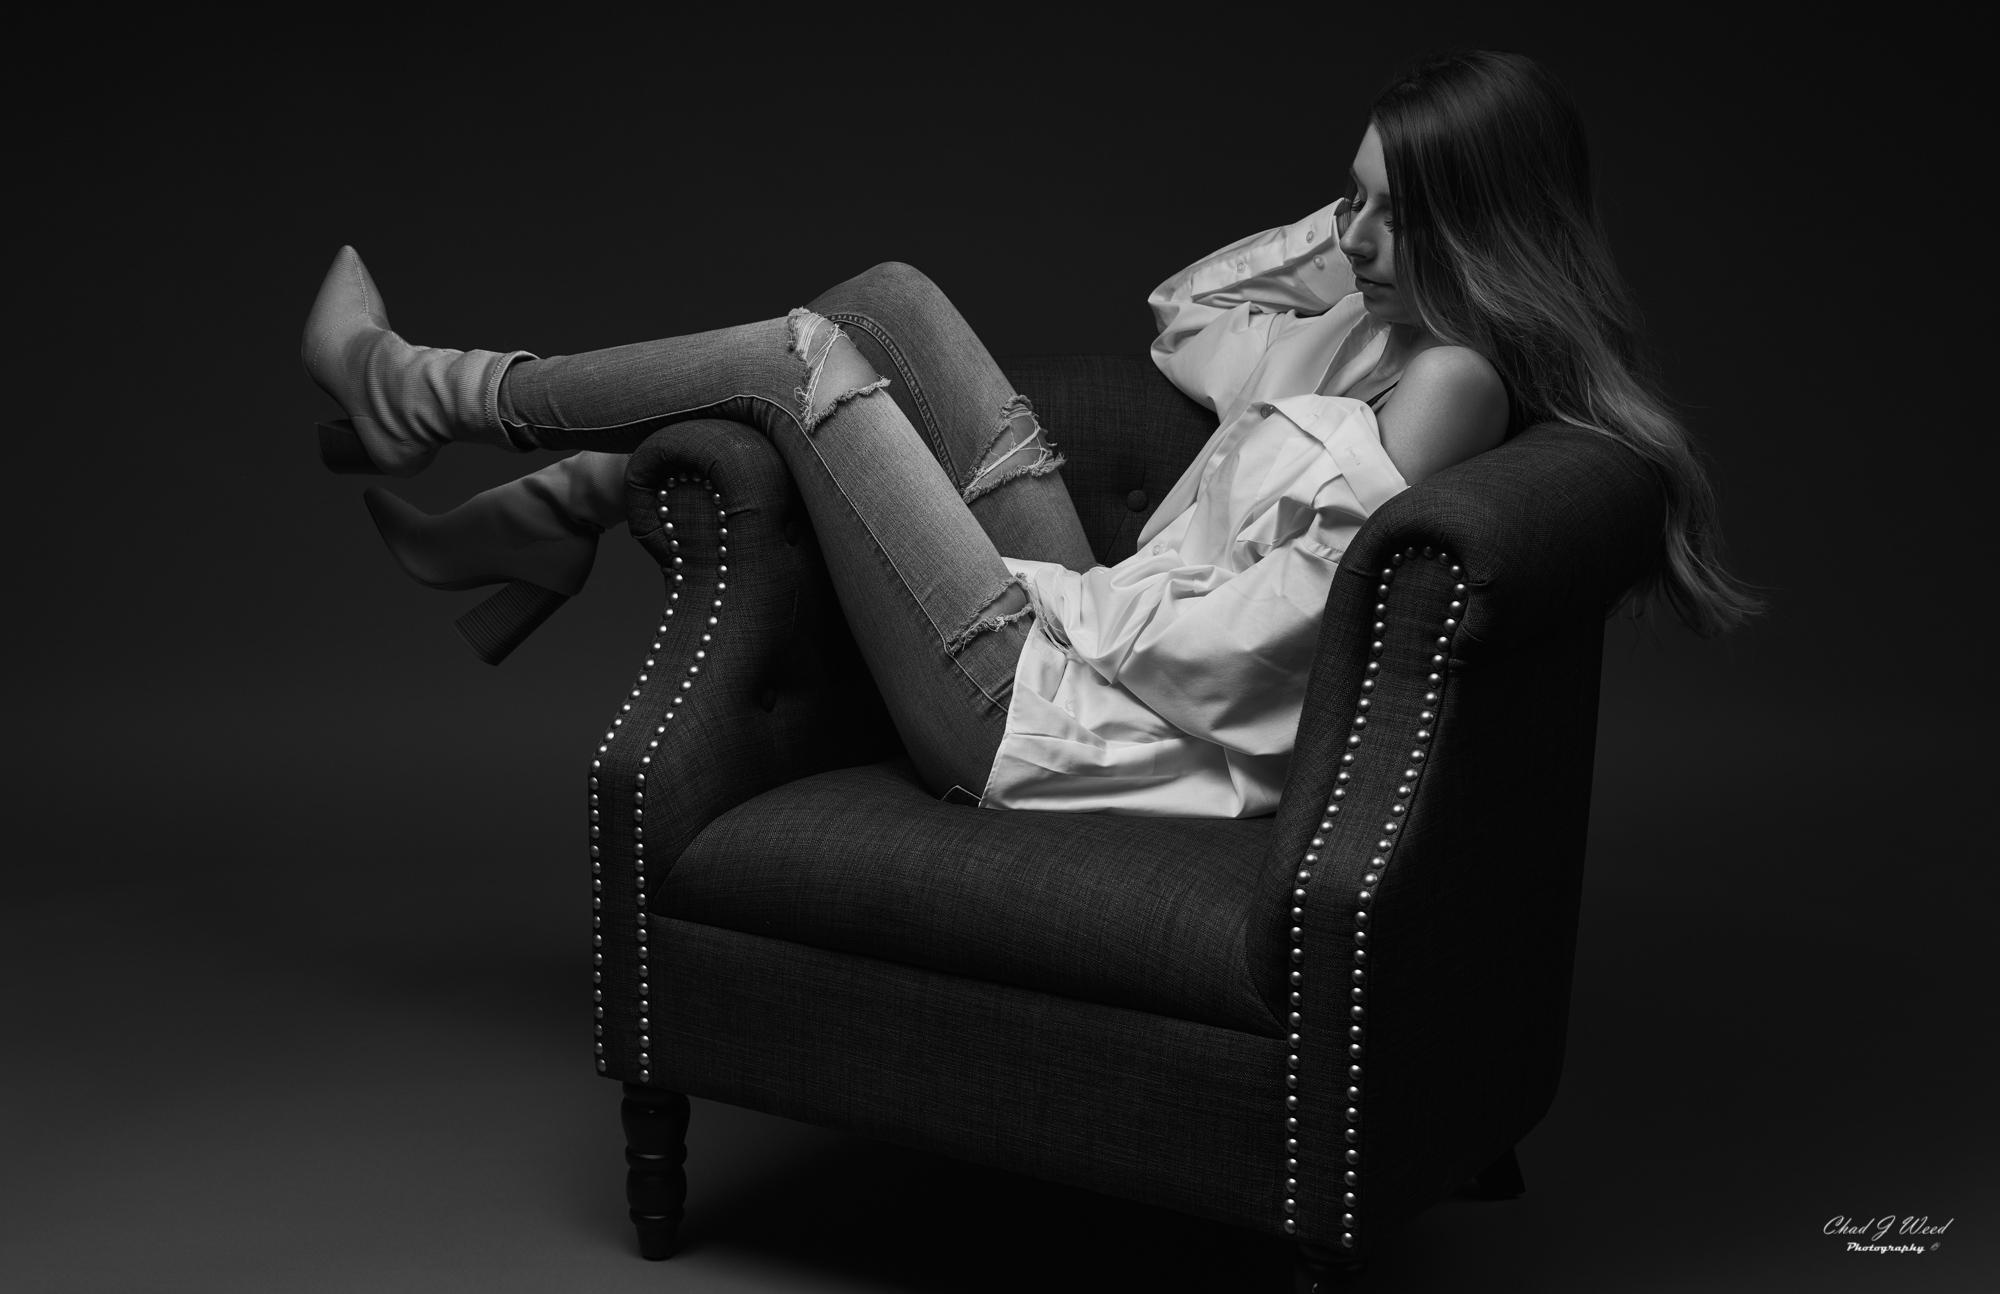 Mariola Fashion Model by Arizona Fashion Portrait Photographer Chad Weed